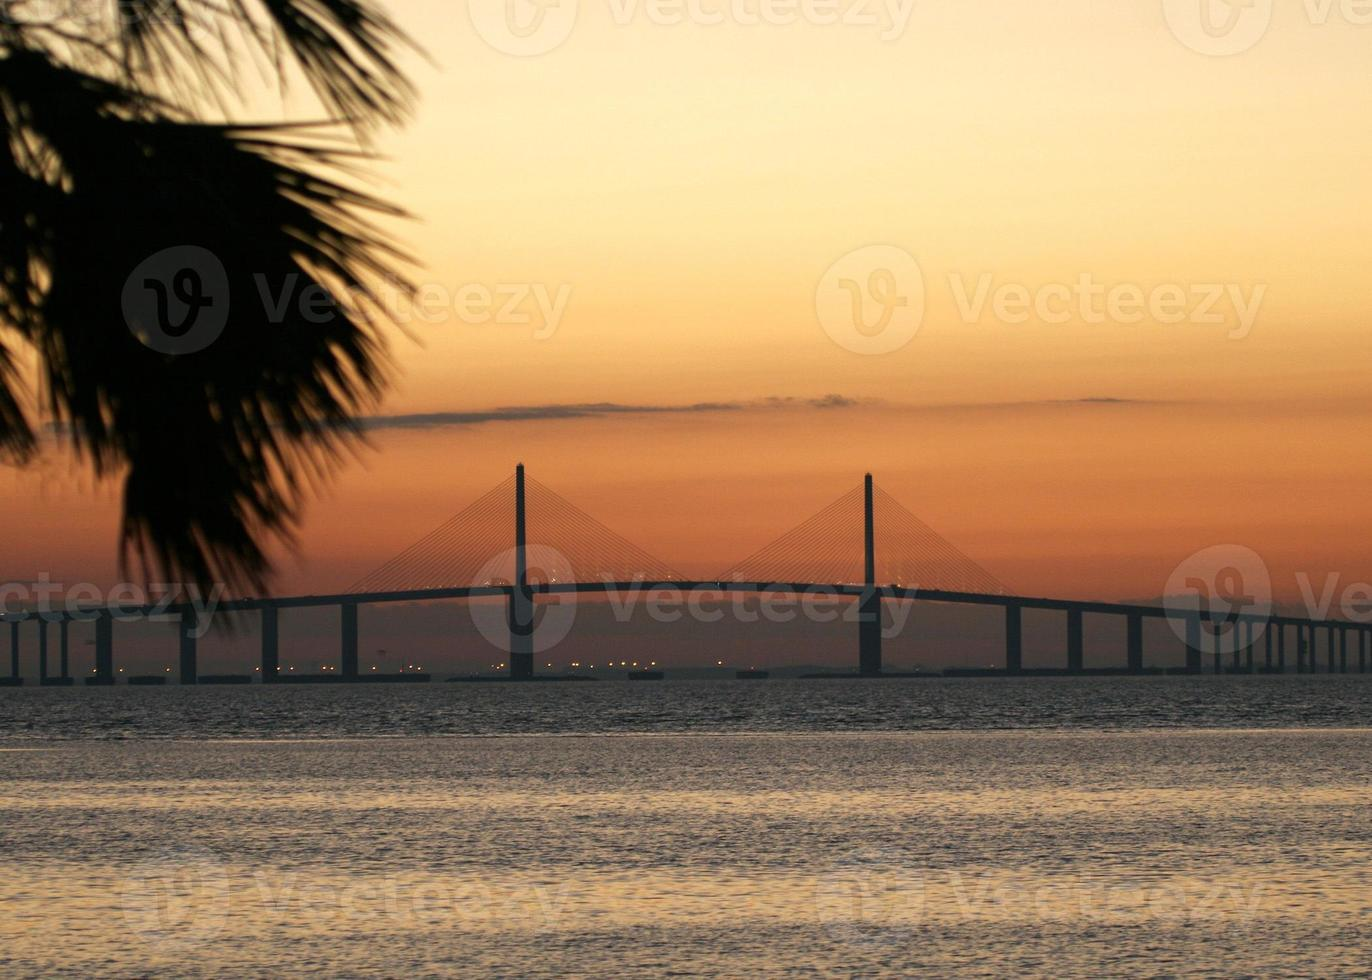 tampa bay skyway bridge vid soluppgången foto